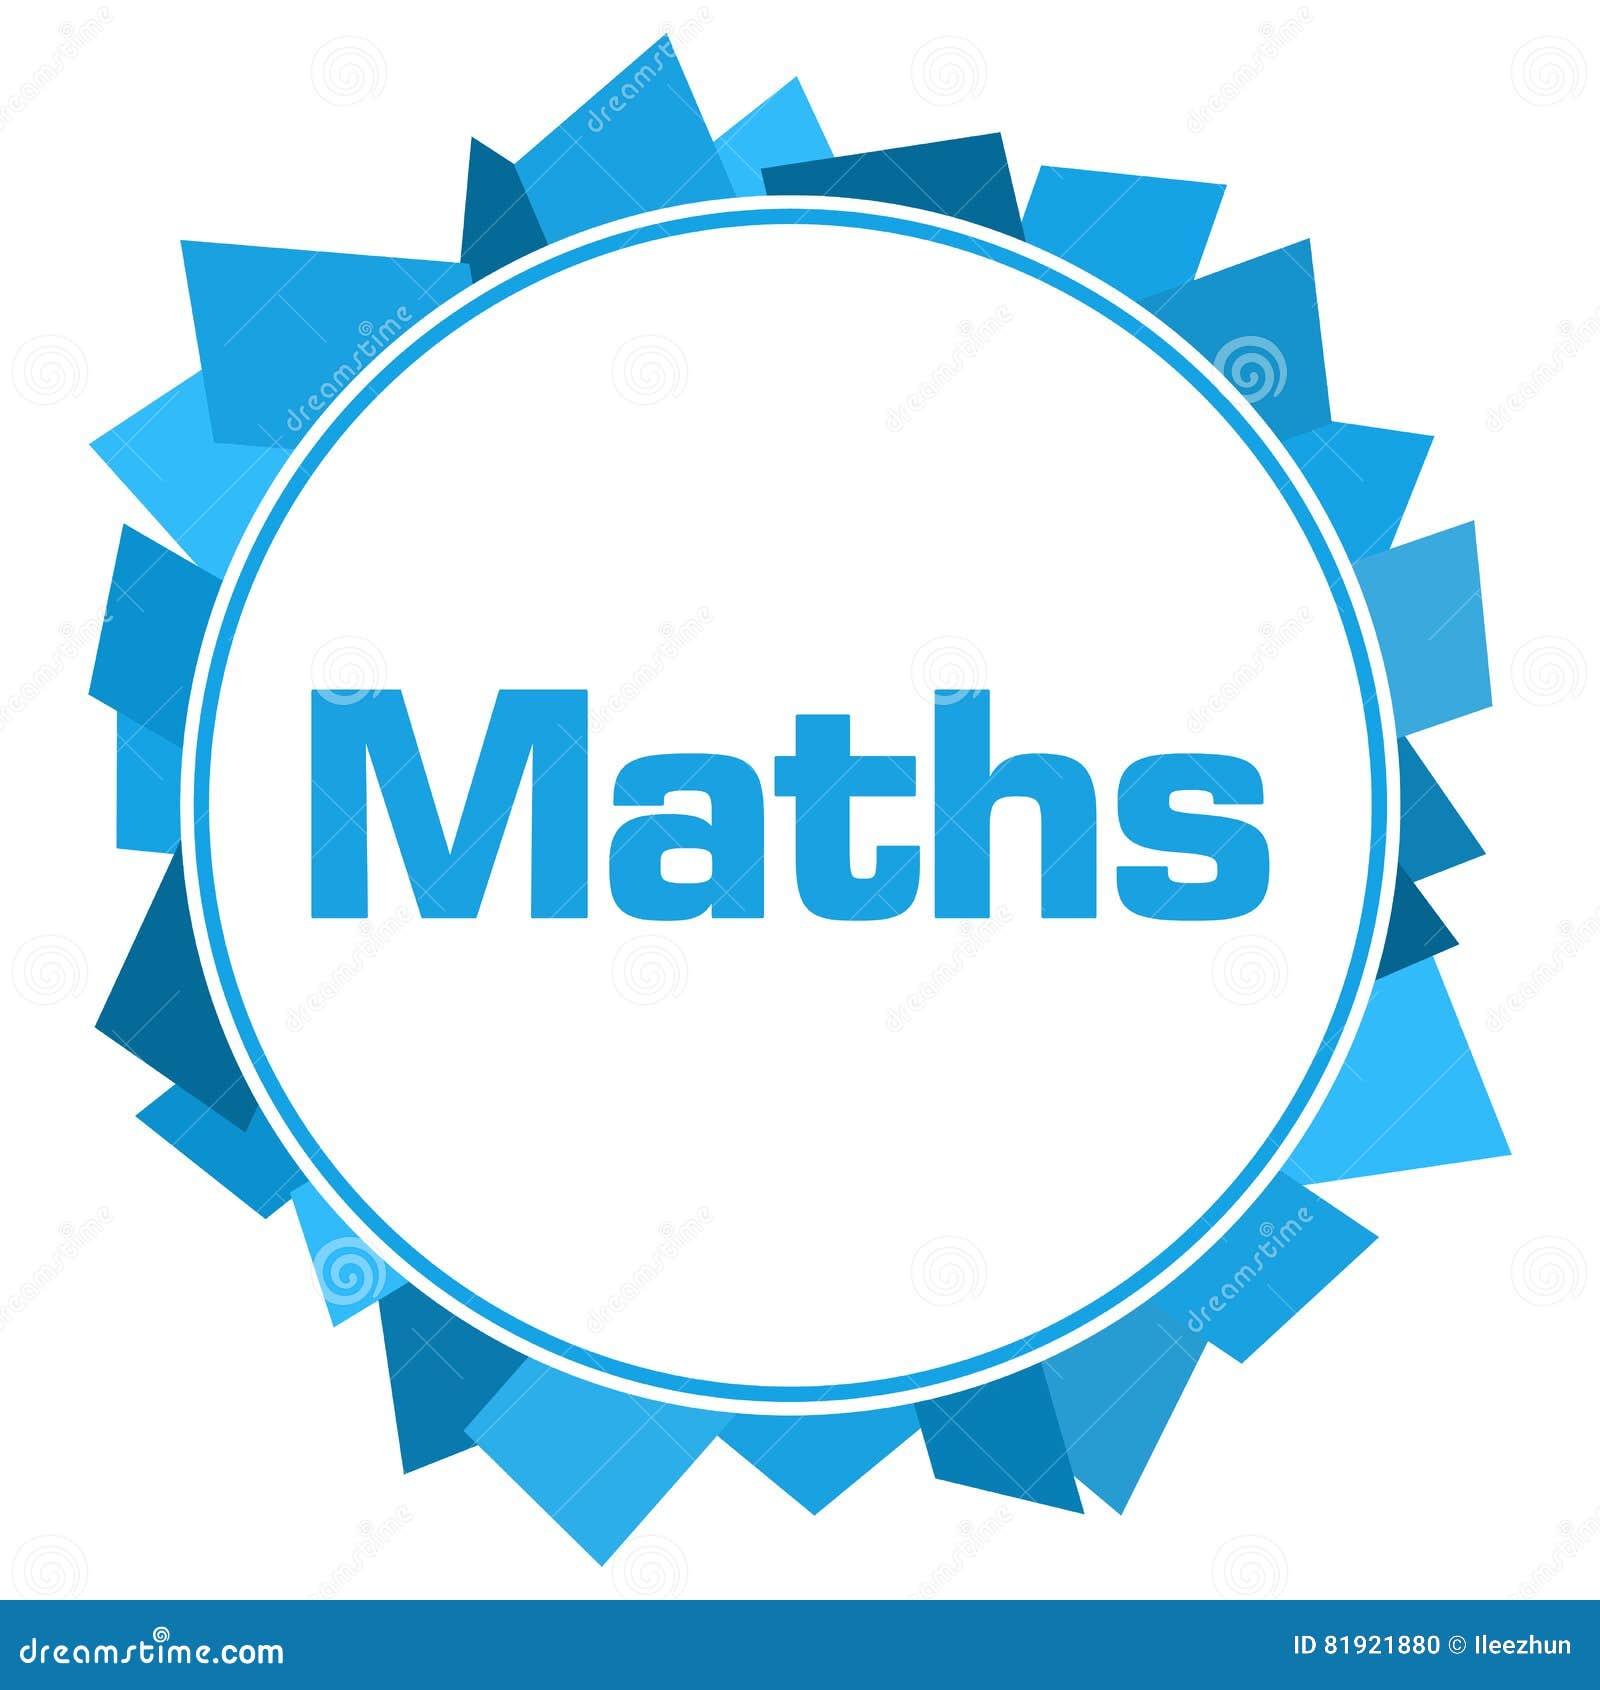 Maths Blue Random Shapes Circle Stock Illustration - Illustration of ...